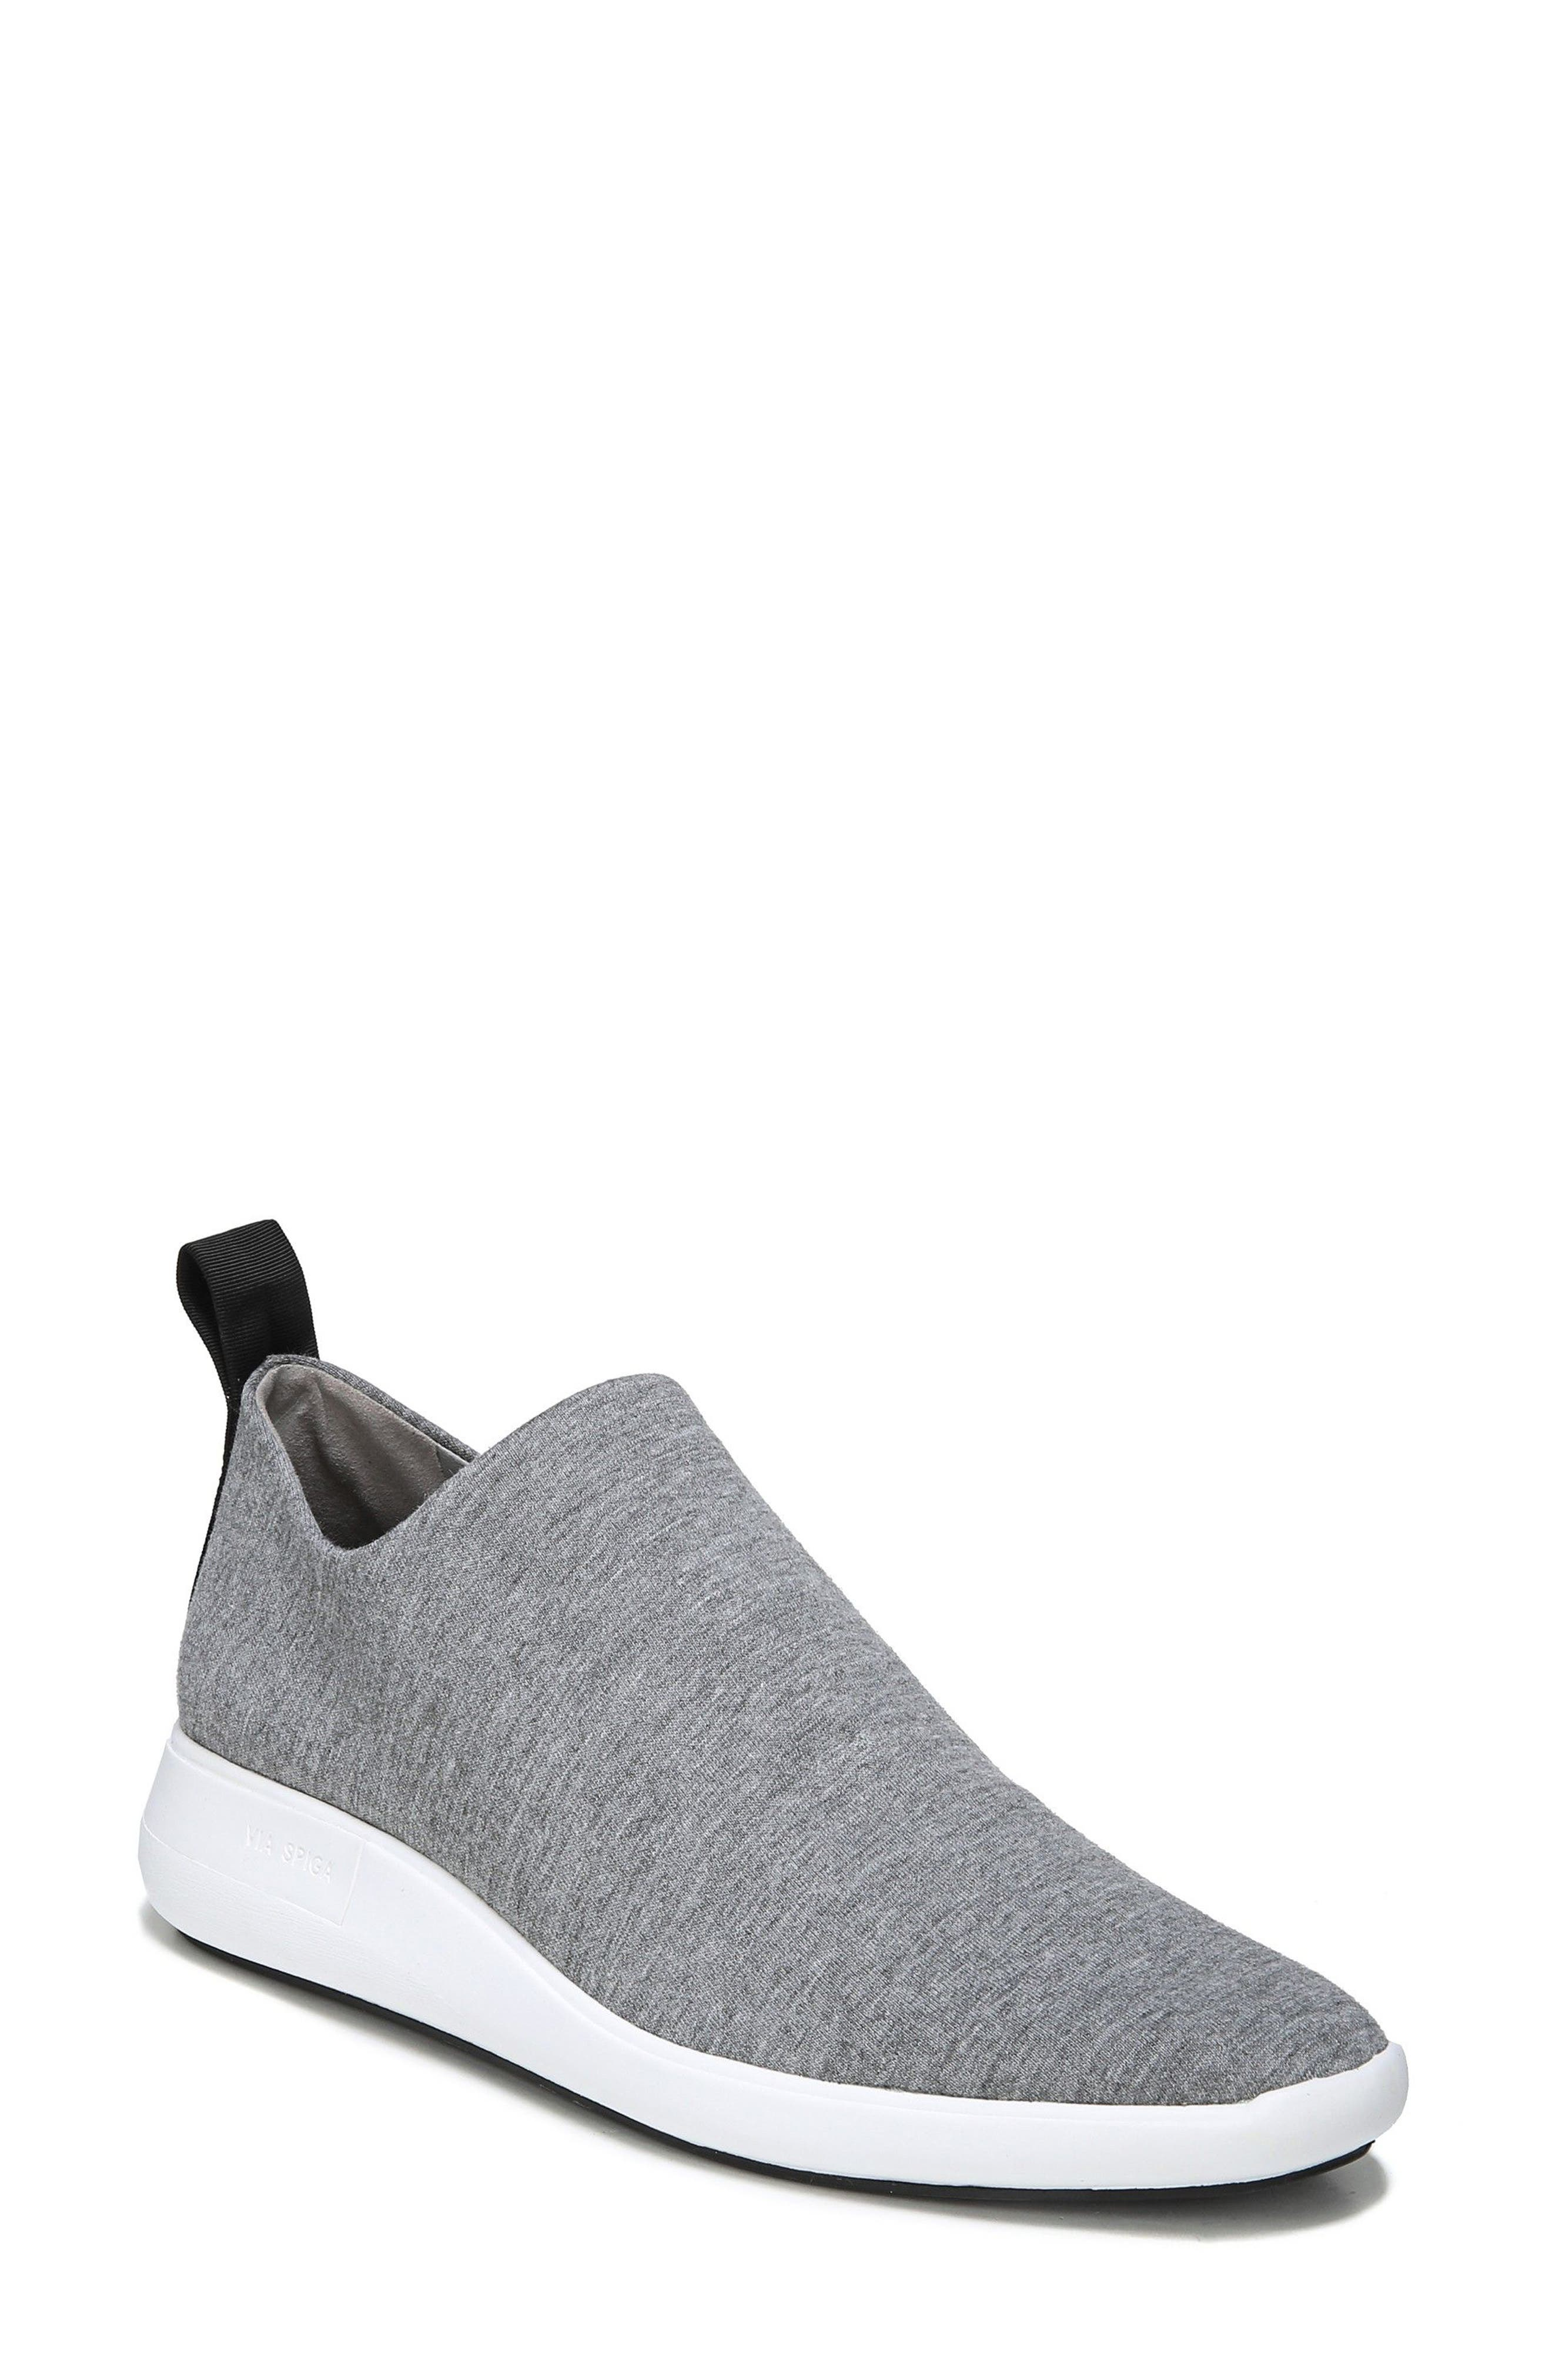 Marlow Slip-On Sneaker,                             Main thumbnail 1, color,